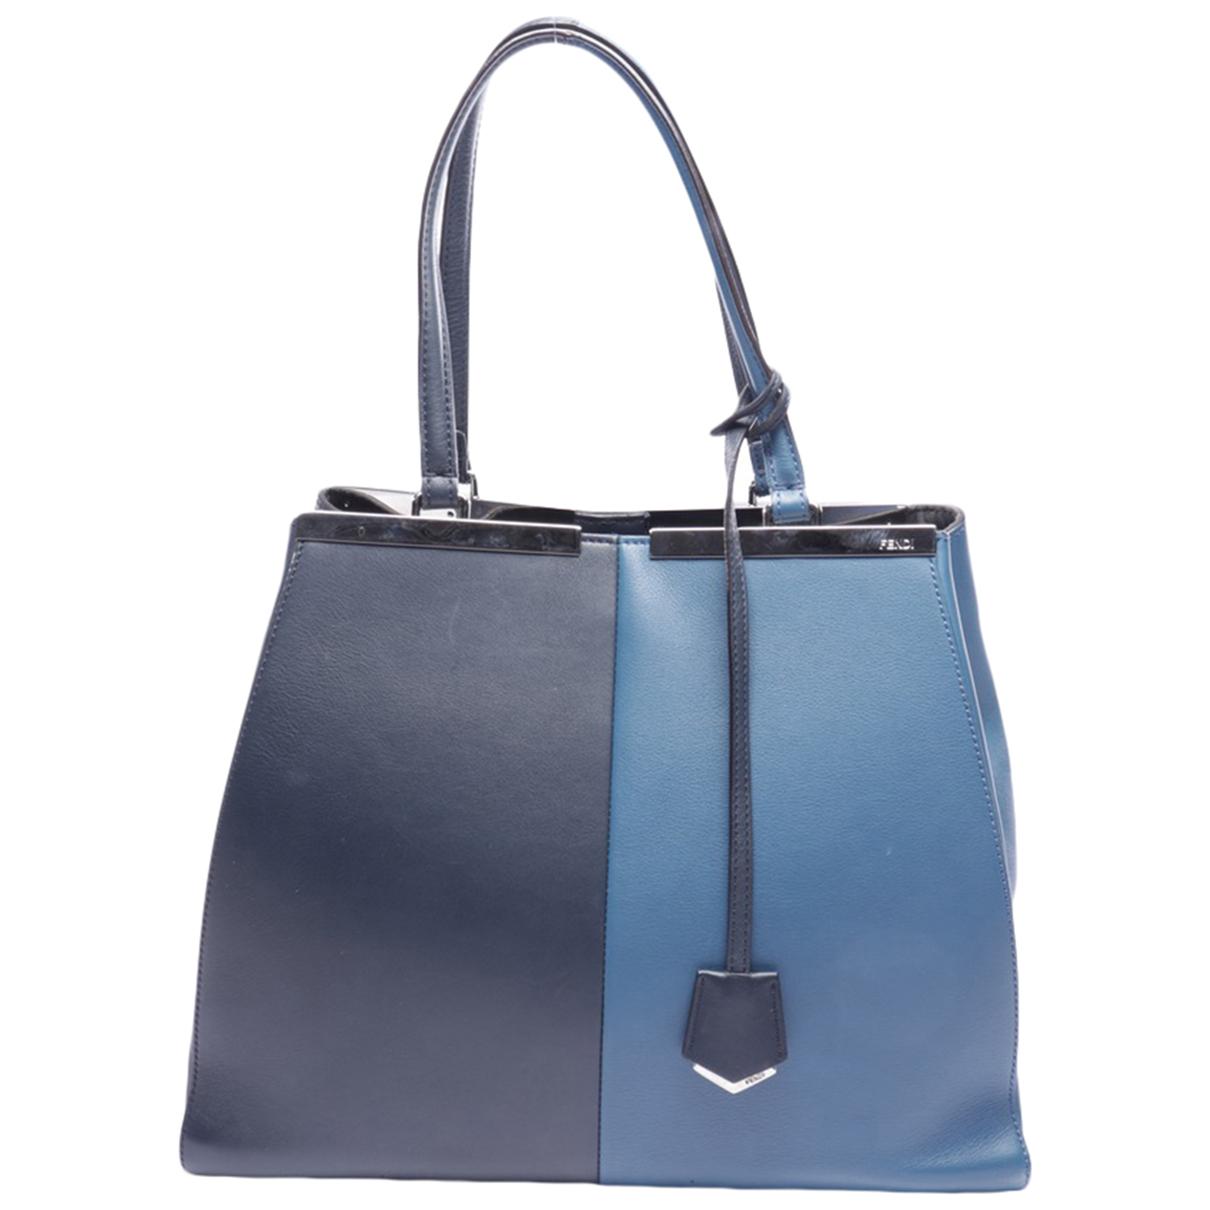 Fendi \N Handtasche in  Blau Leder